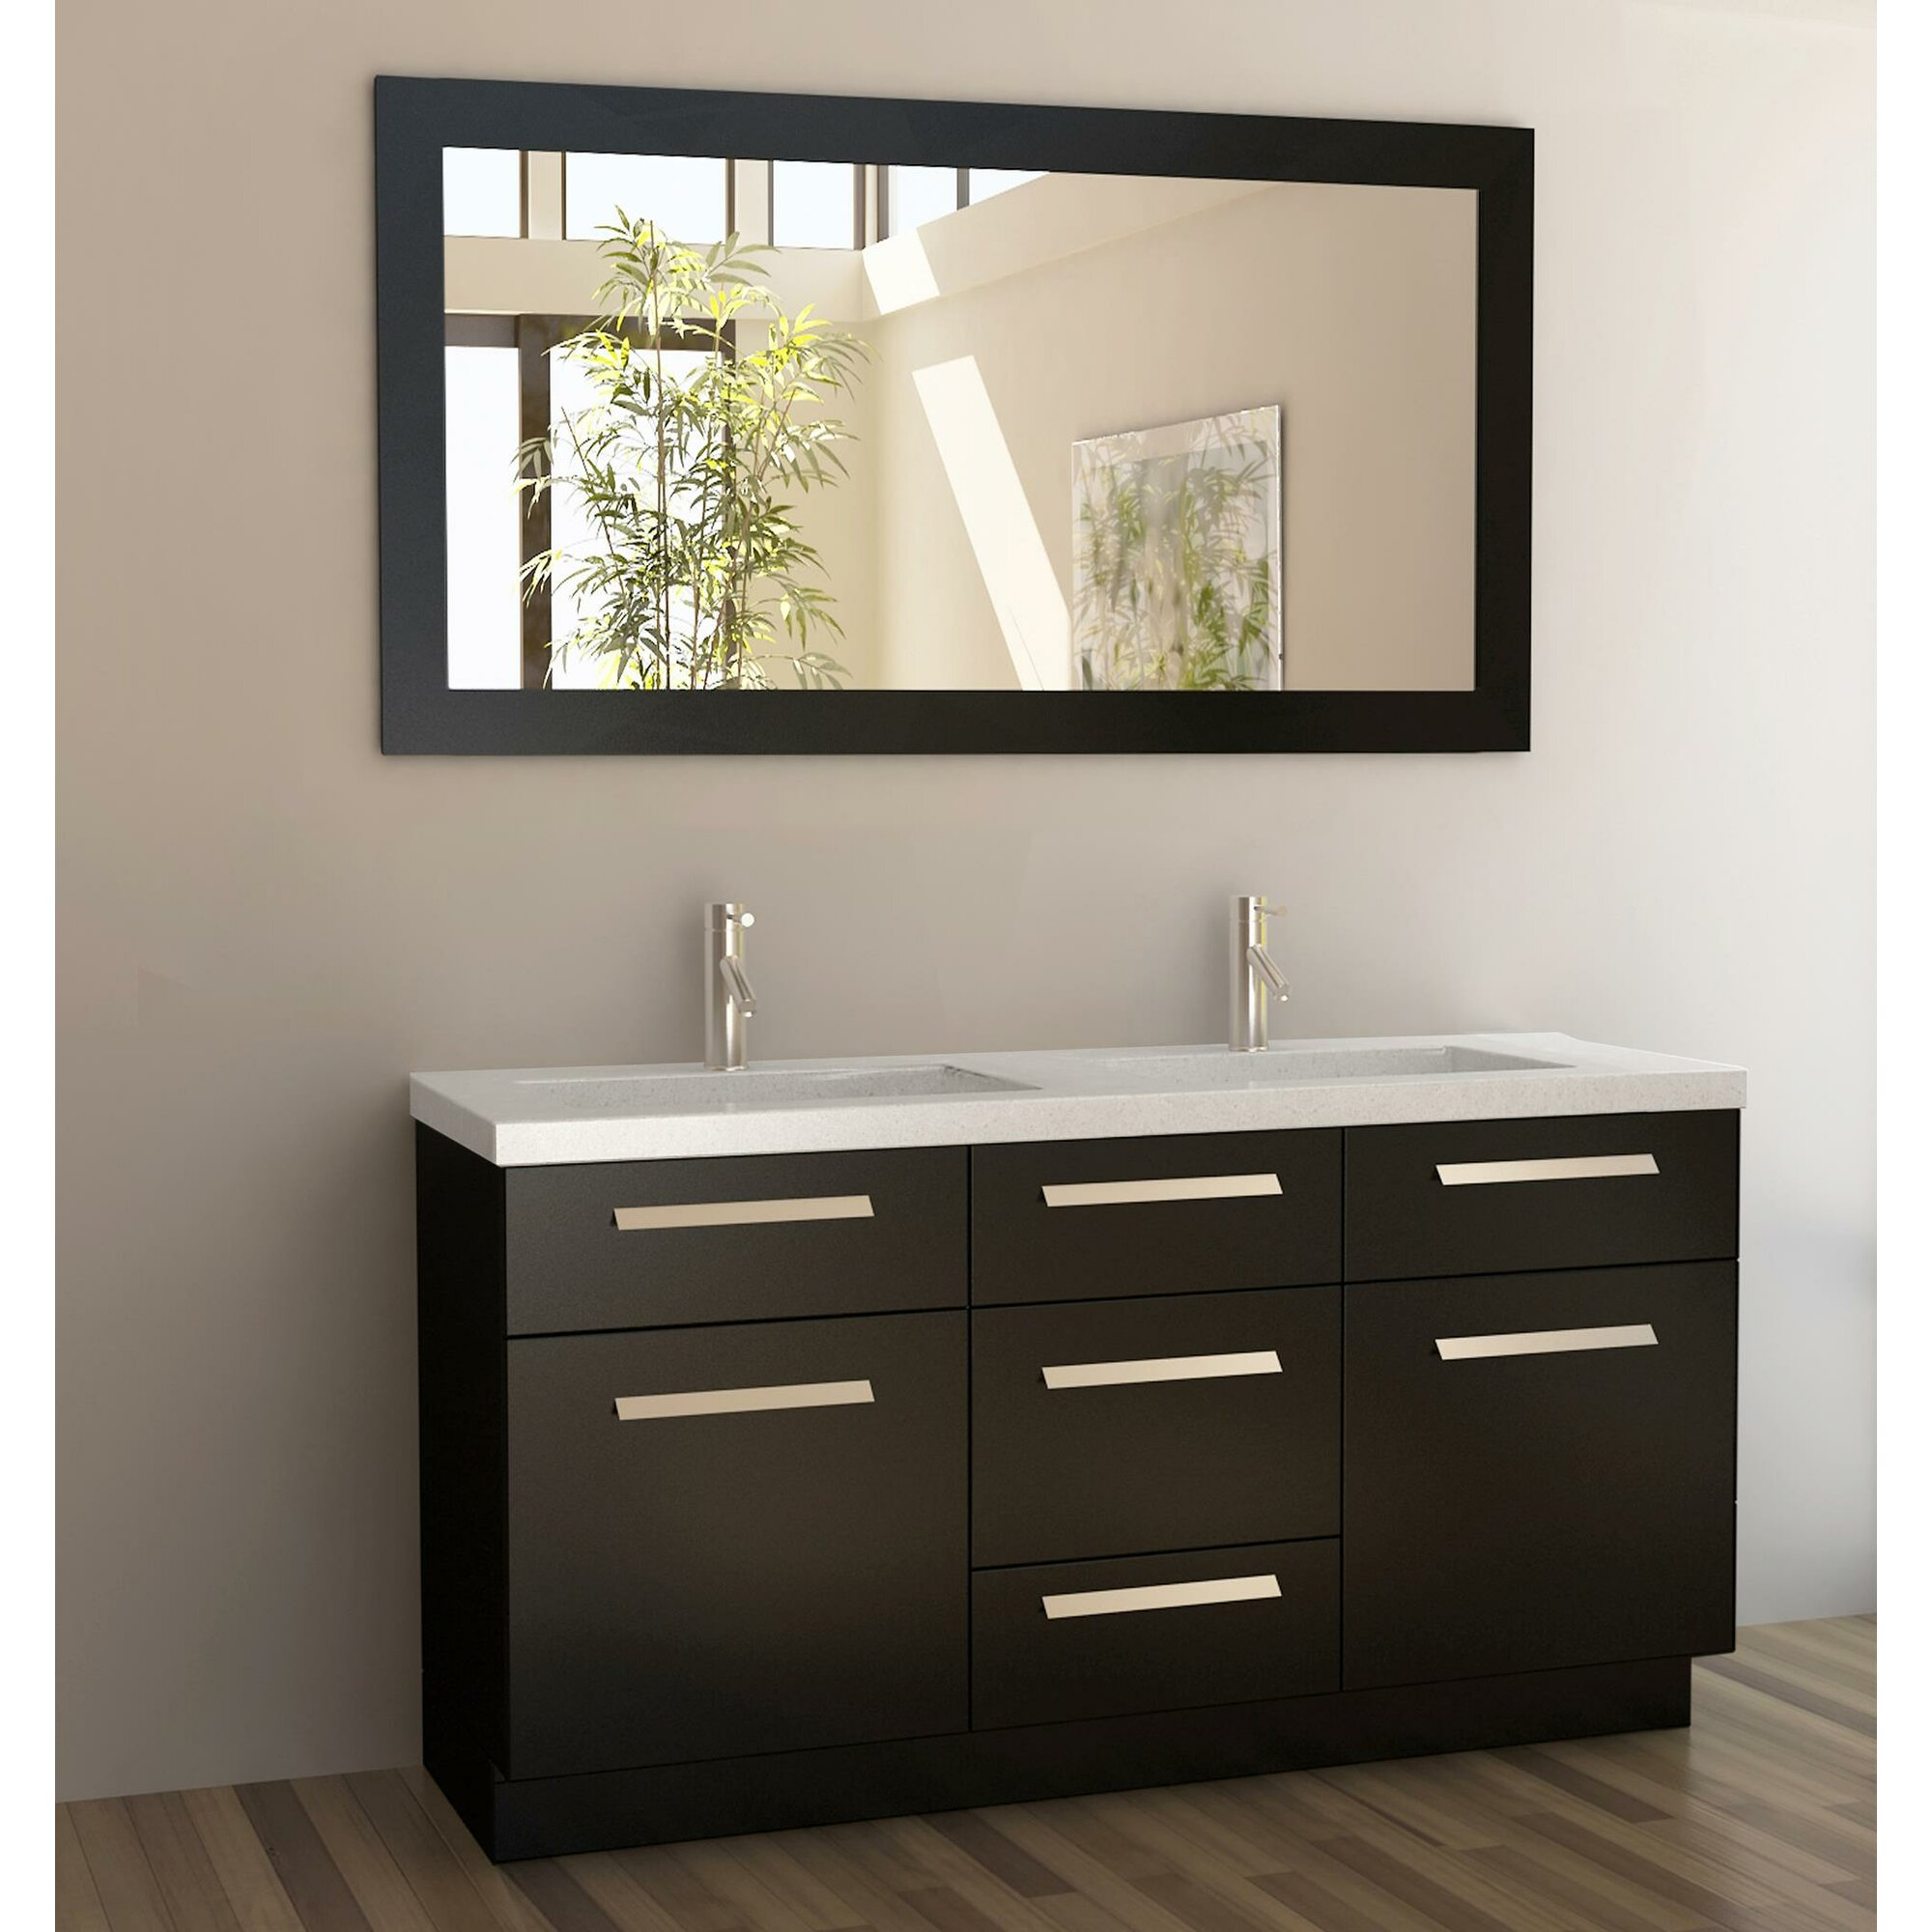 Double bathroom vanity - Arnette 60 Double Bathroom Vanity Set With Mirror